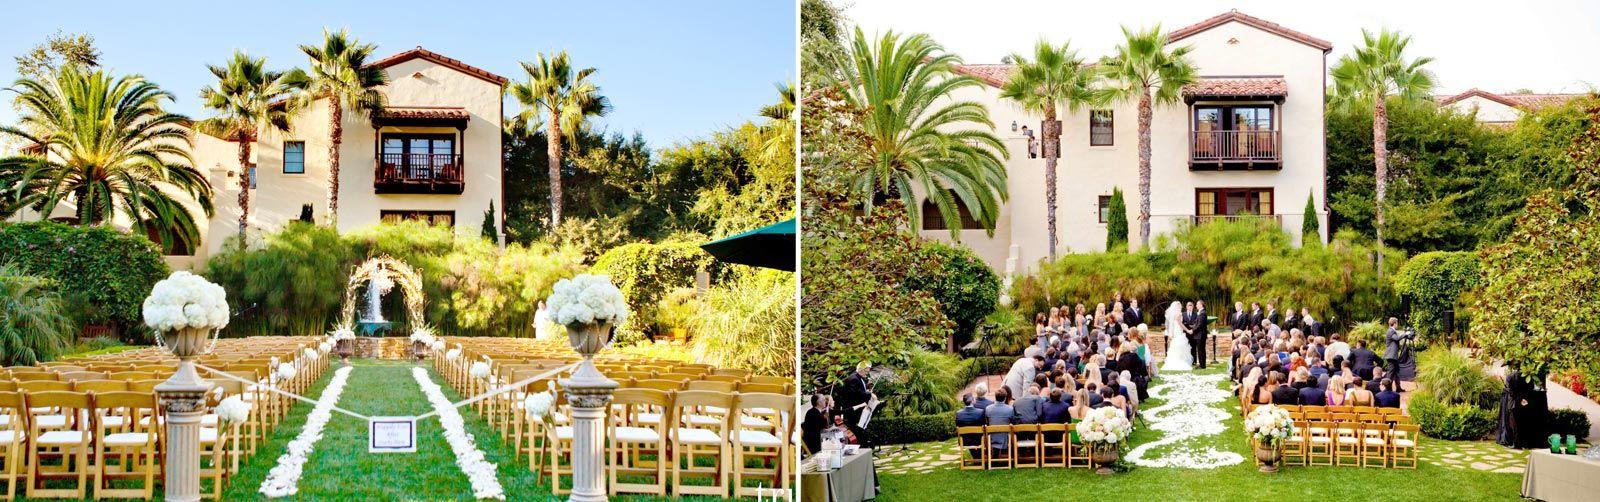 Wedding Hiltonlajollatorreypinespool Wedding Hotel Del Wedding La Hotel  Catamarin Wedding San Diego Ca Flowerfusion   14